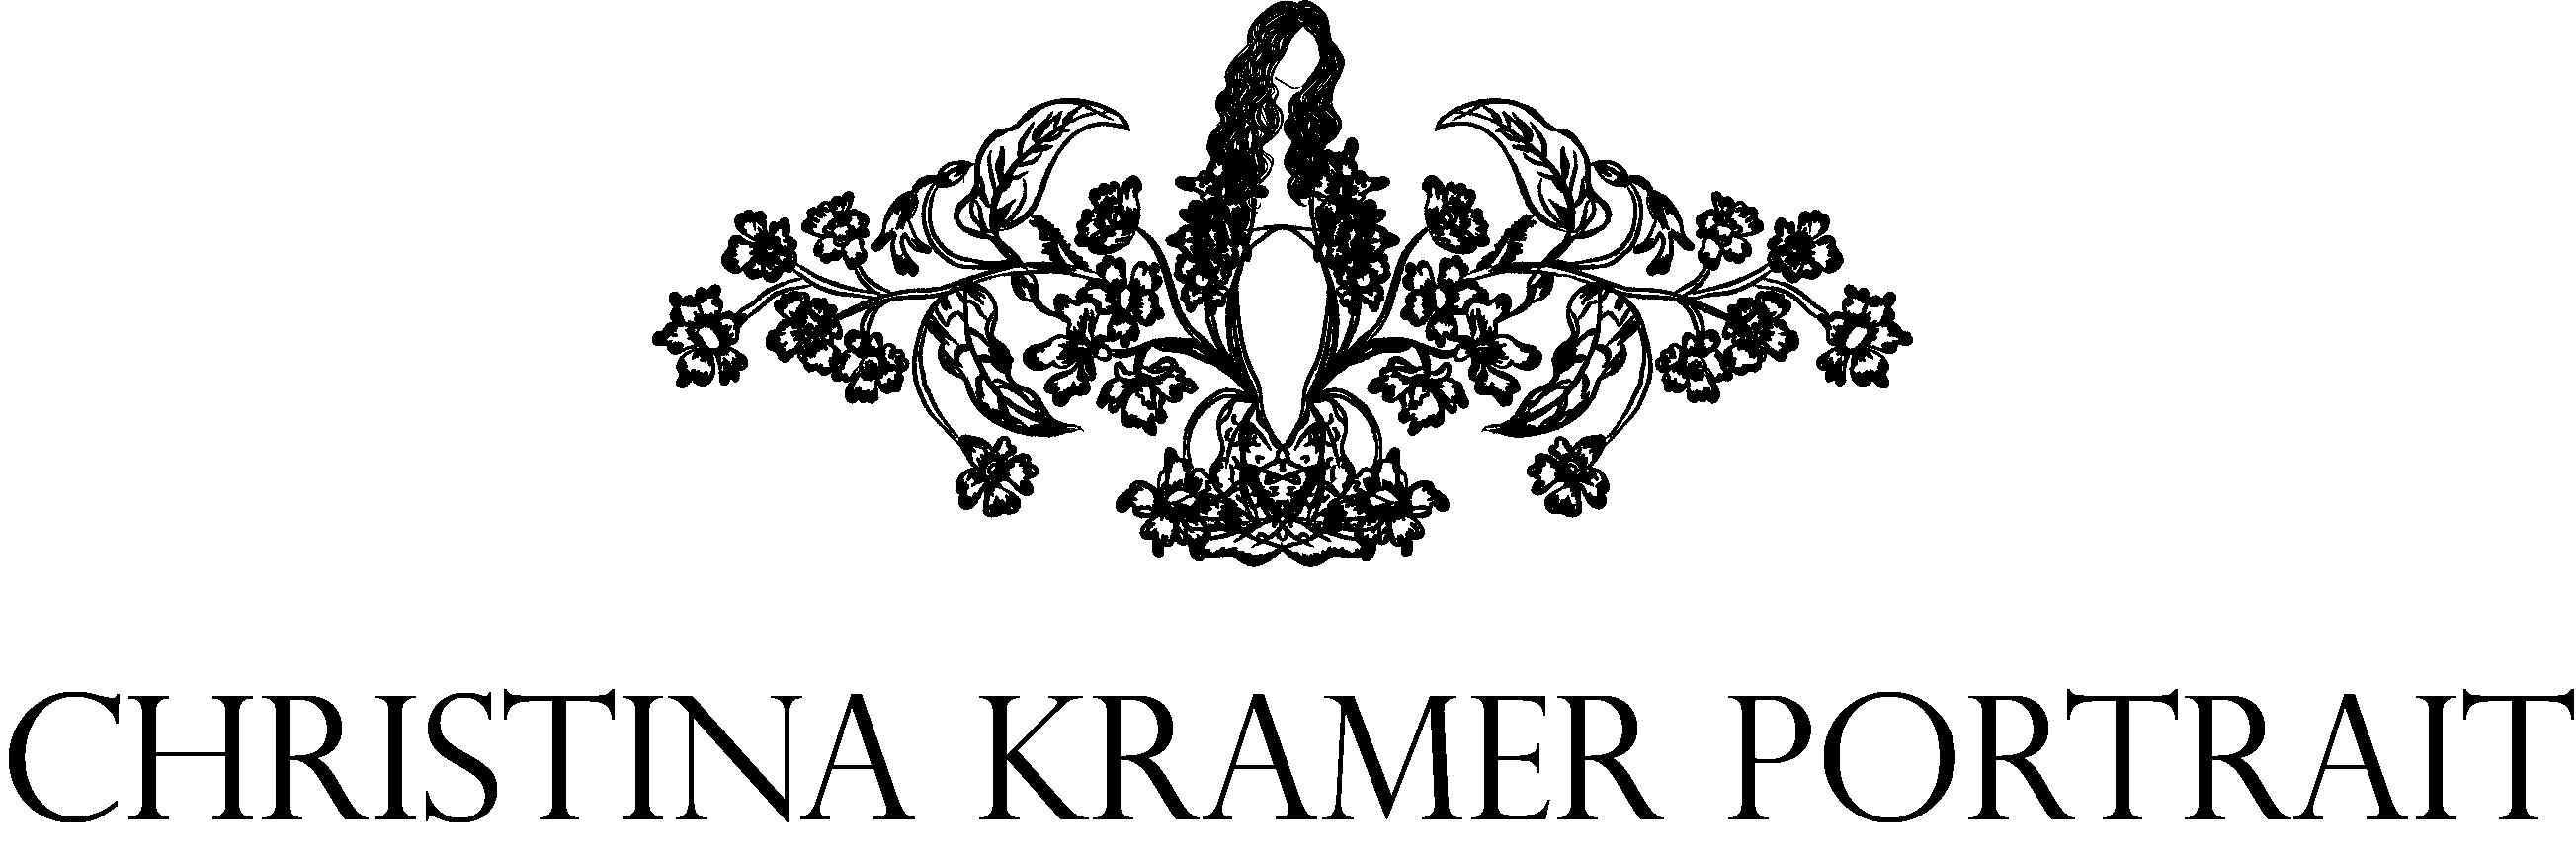 CTKPHOTOS